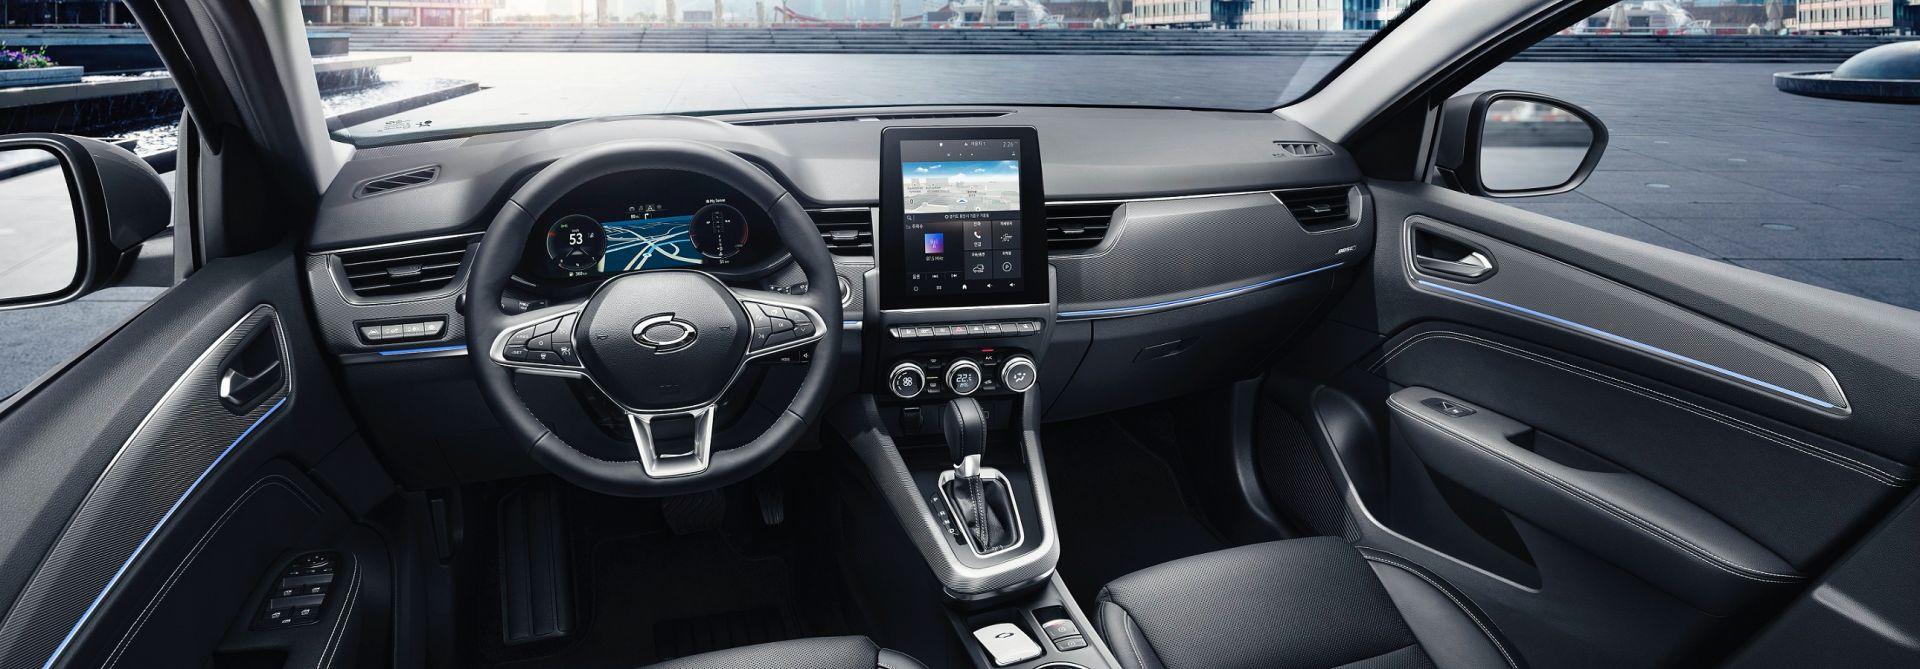 Renault_Samsung_XM3_0004